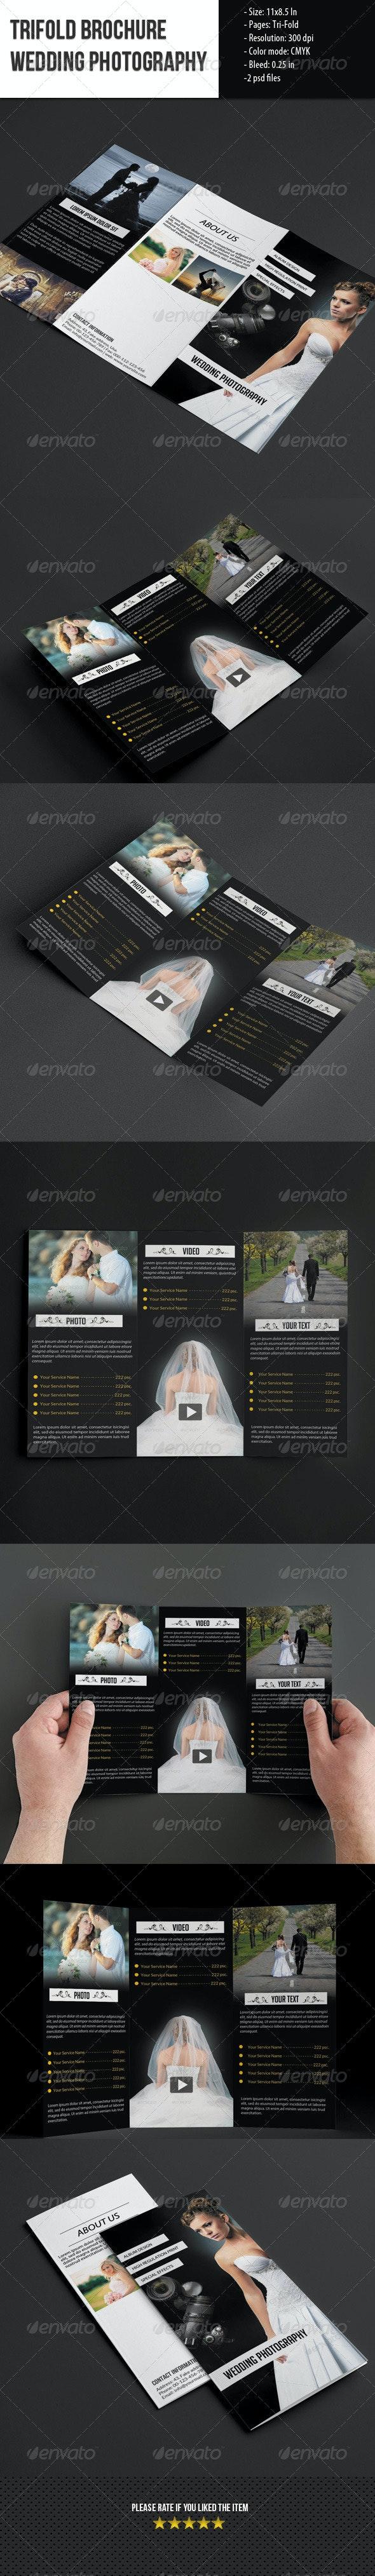 Trifold Brochure for Wedding Photography - Portfolio Brochures